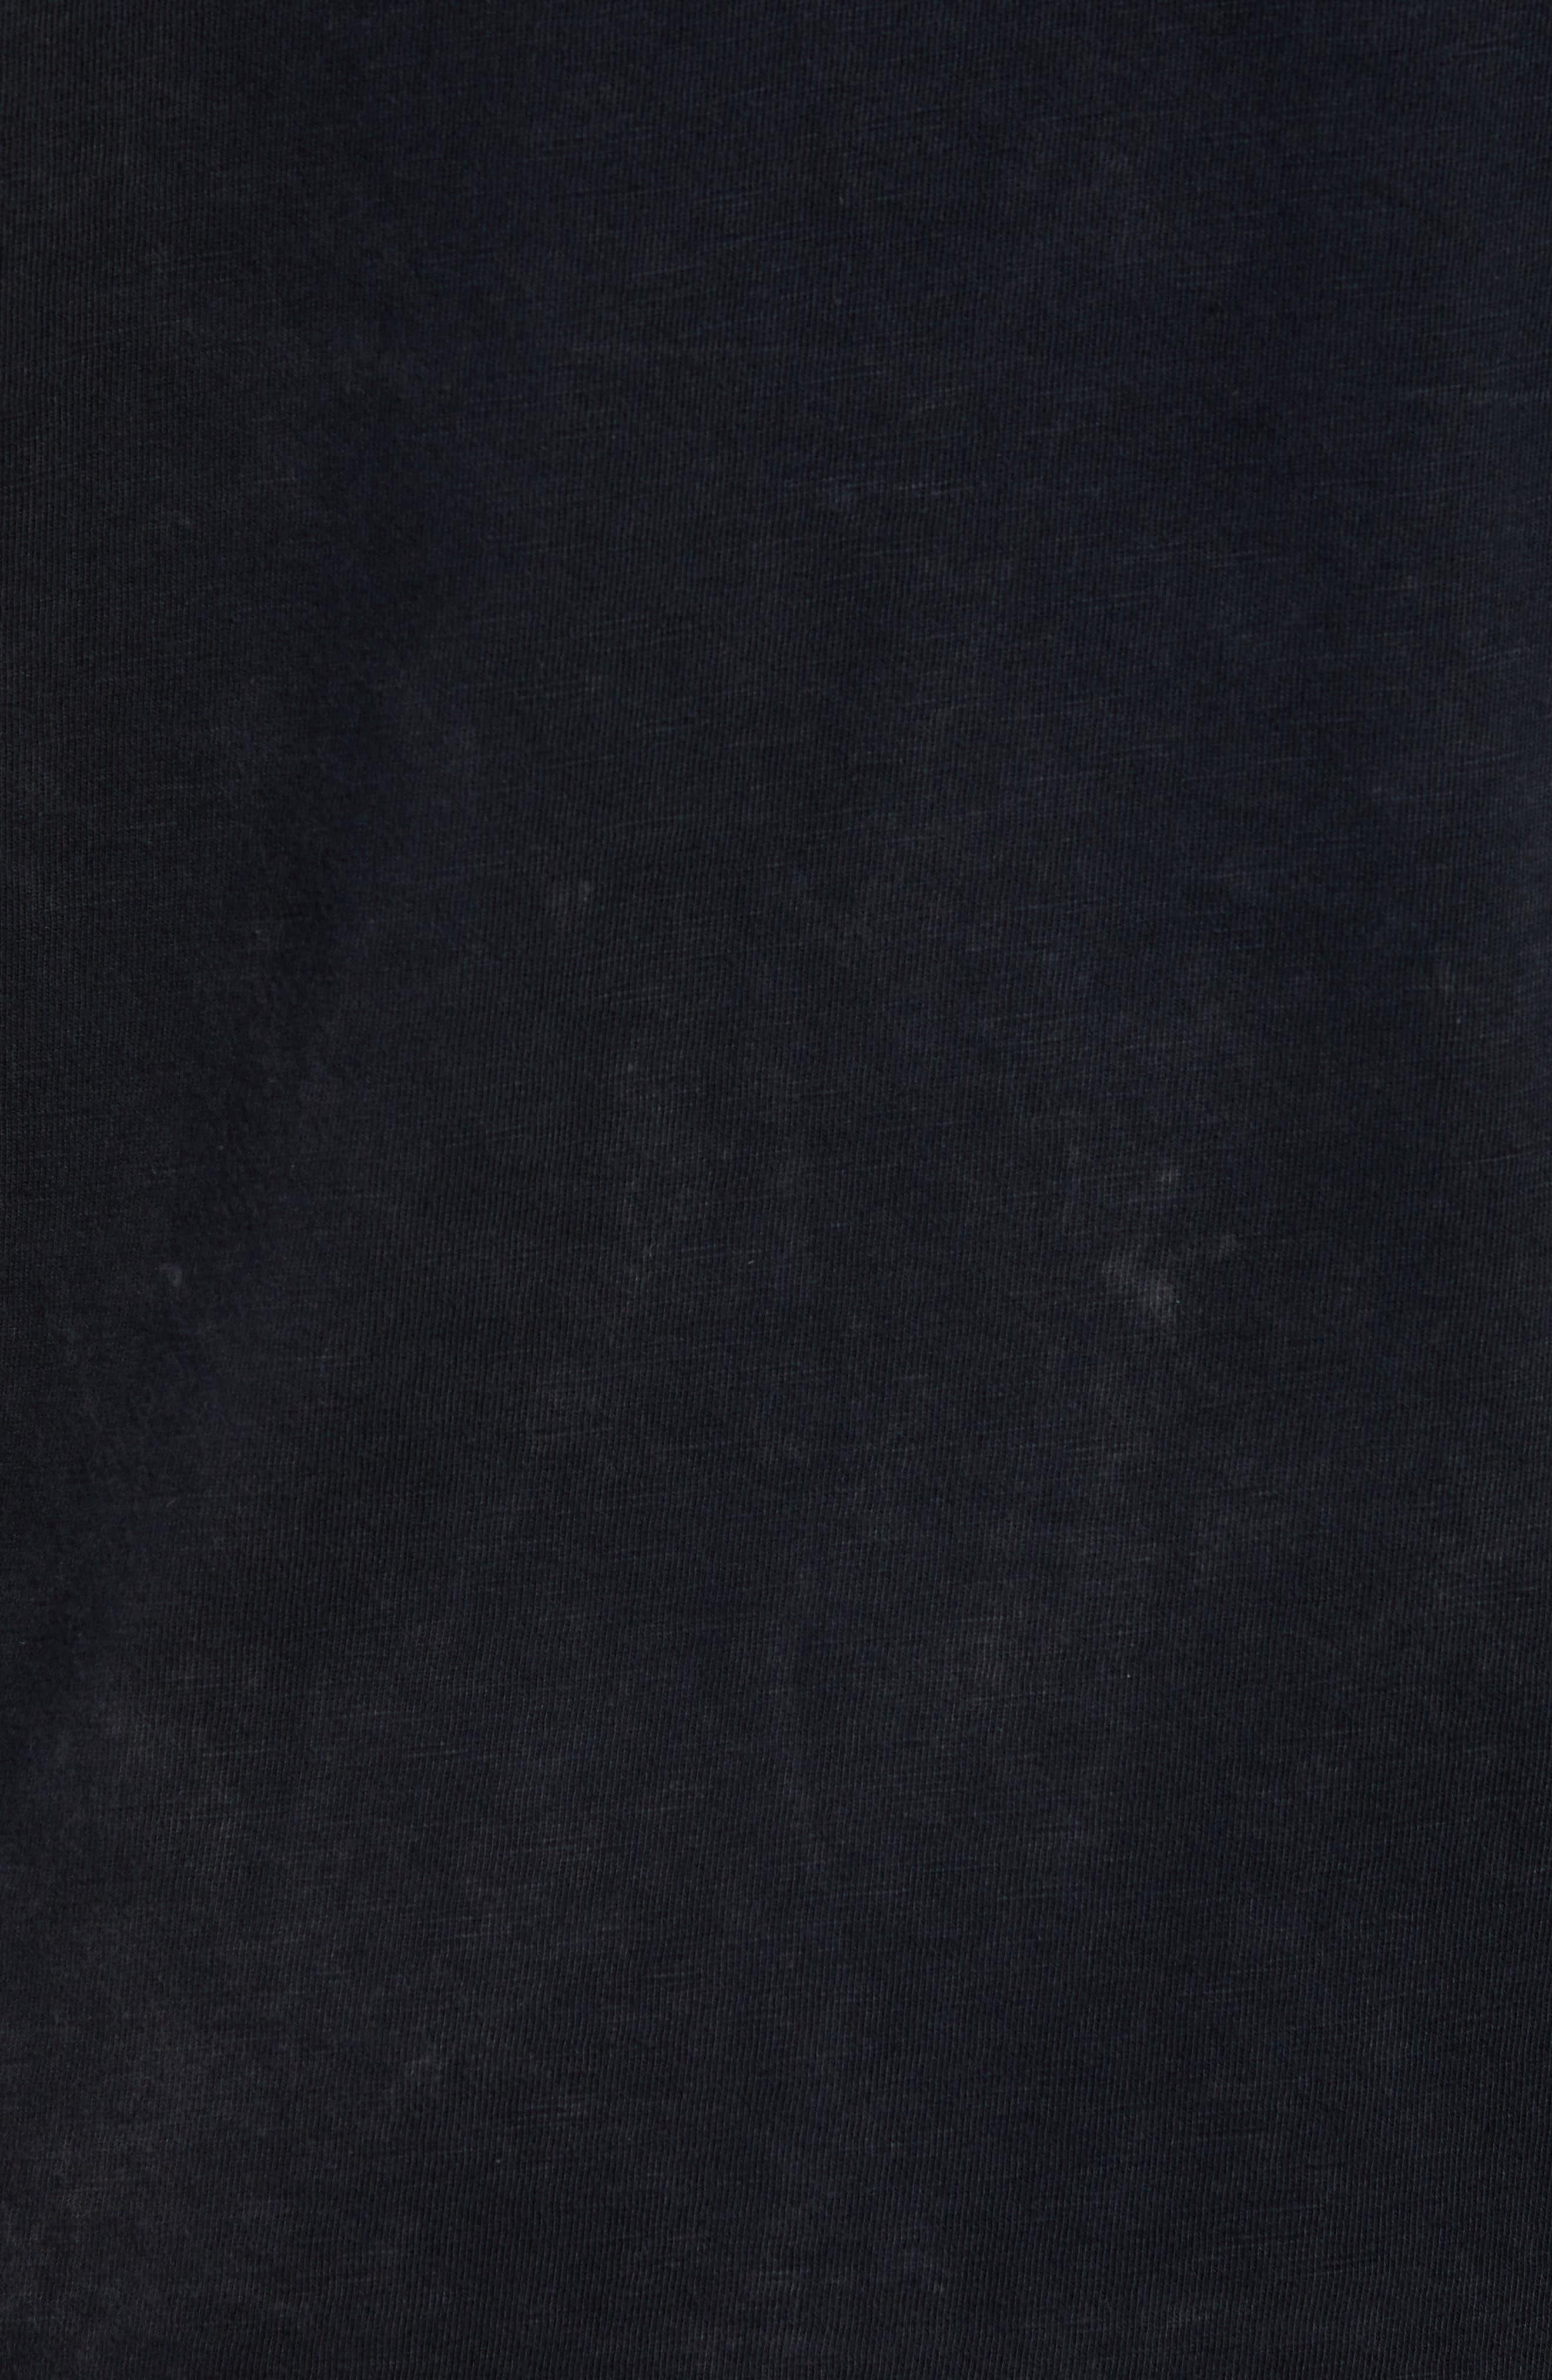 Vampire Graphic Long Sleeve T-Shirt,                             Alternate thumbnail 5, color,                             BLACK